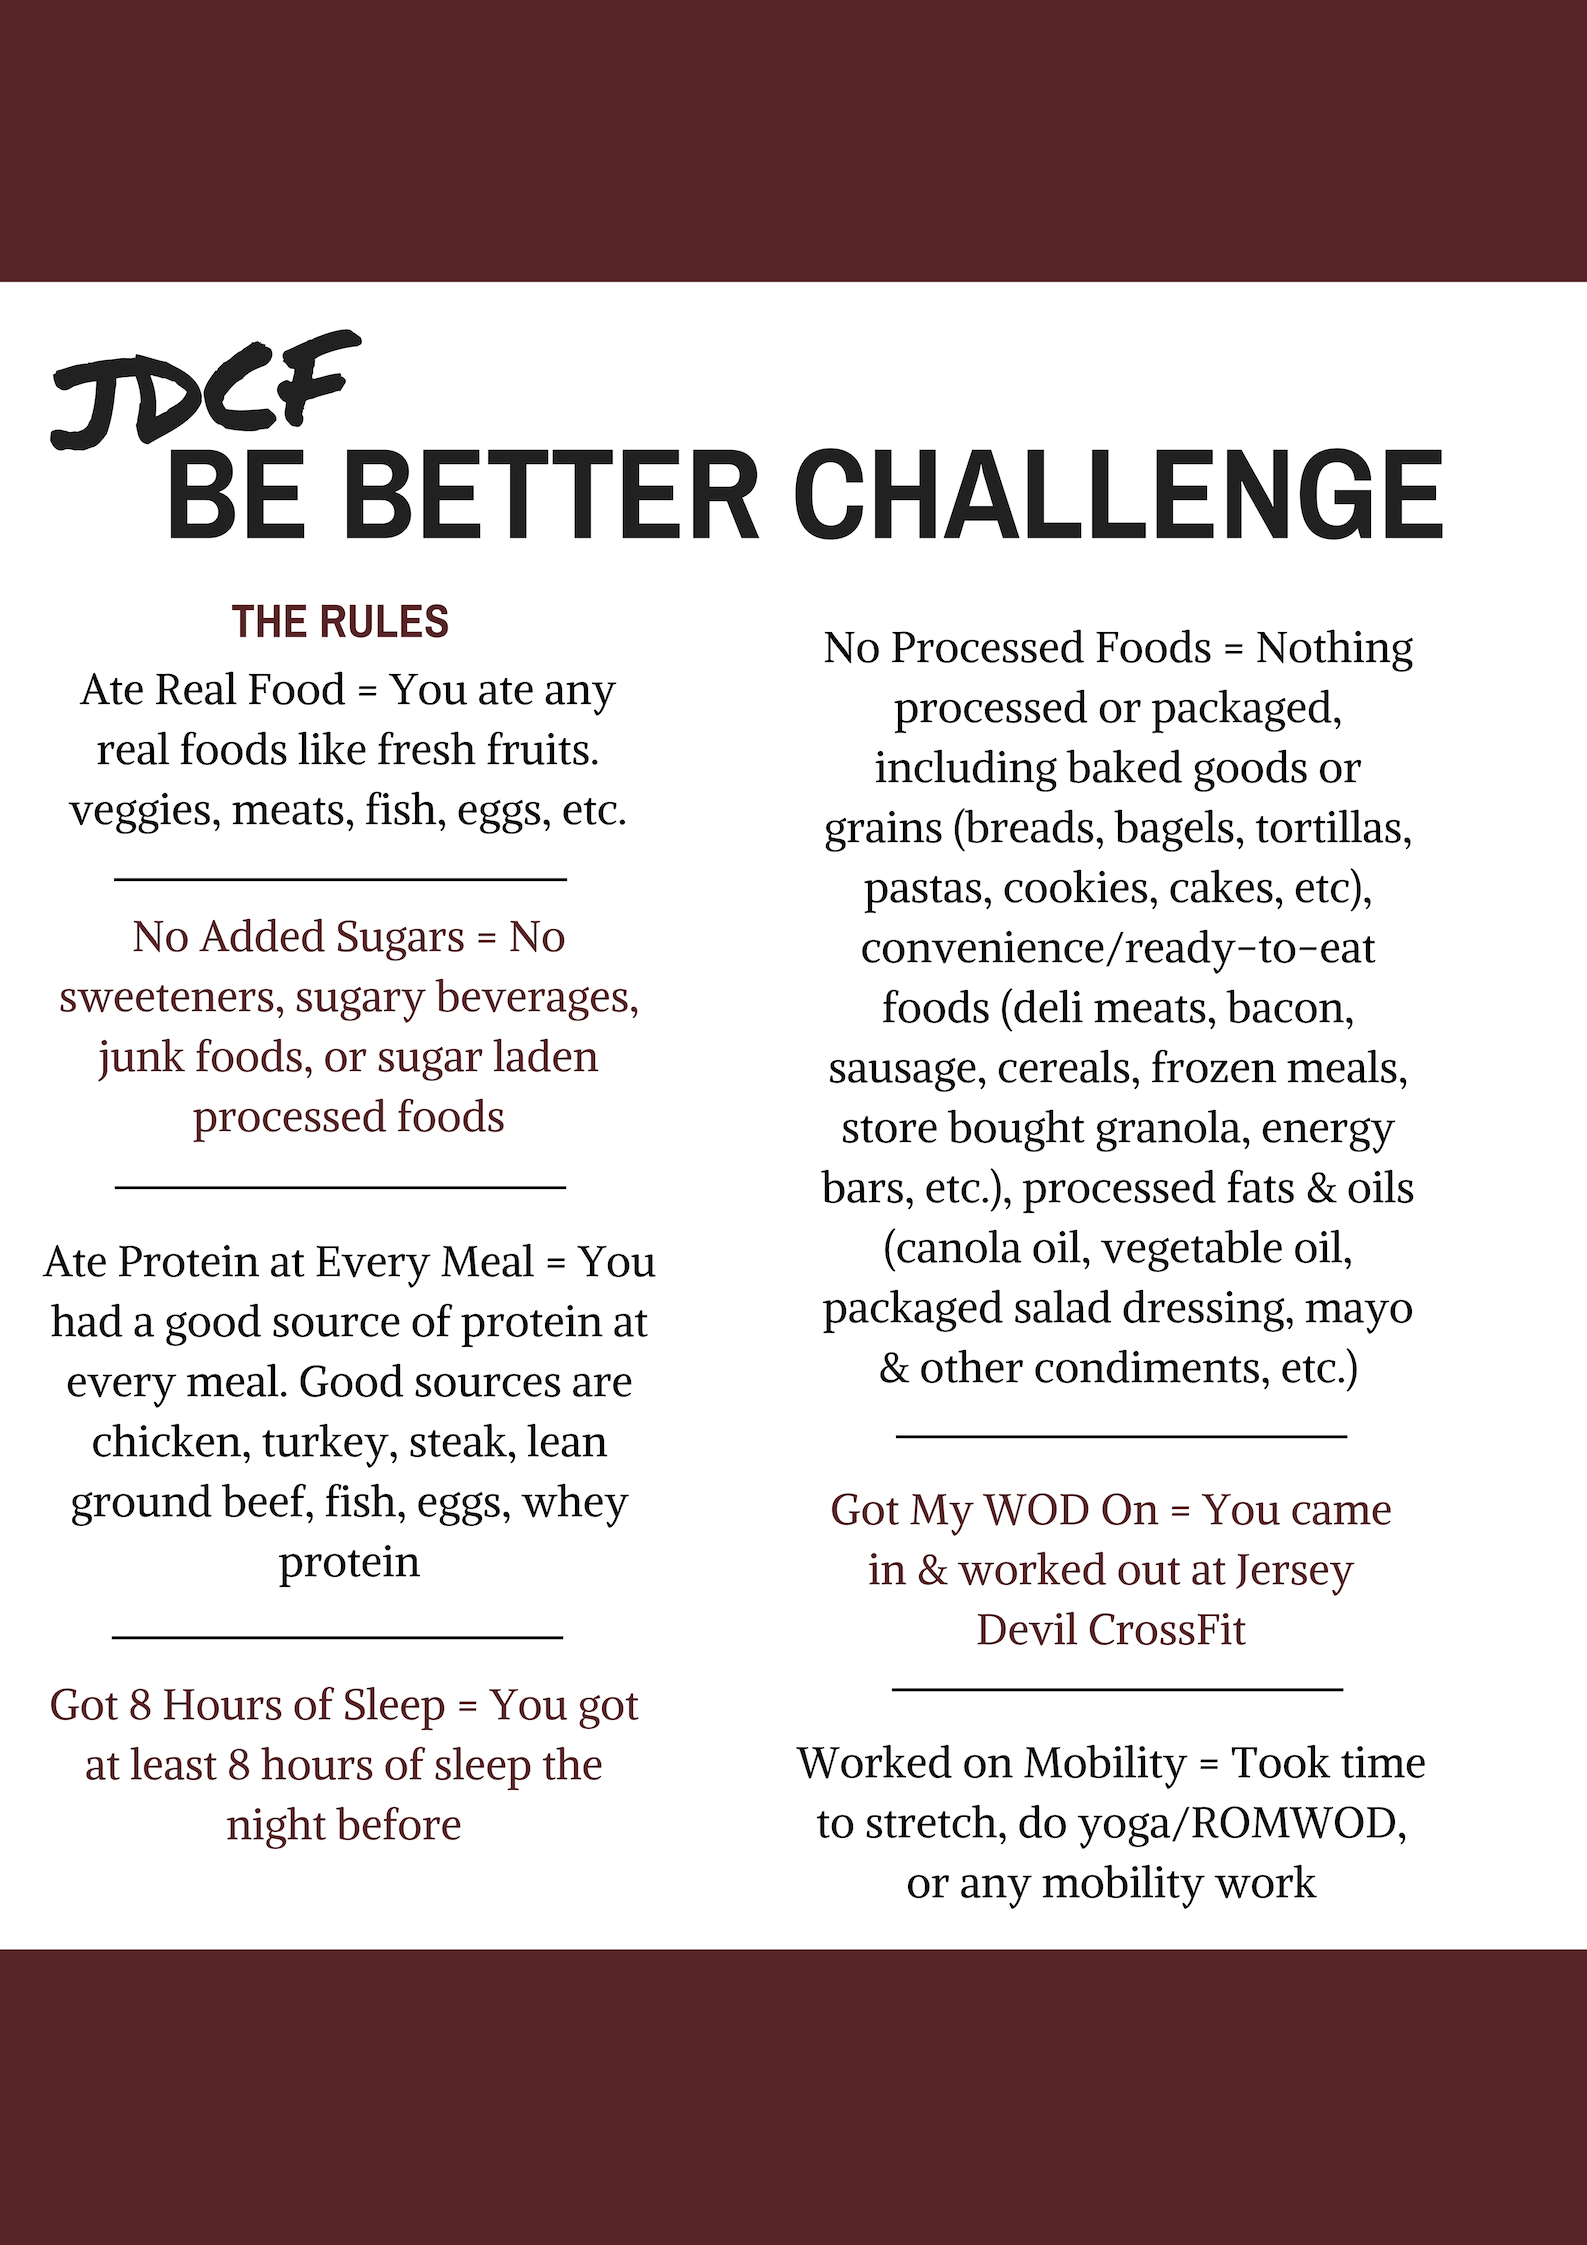 JDCF Nutrition Challenge (1).png